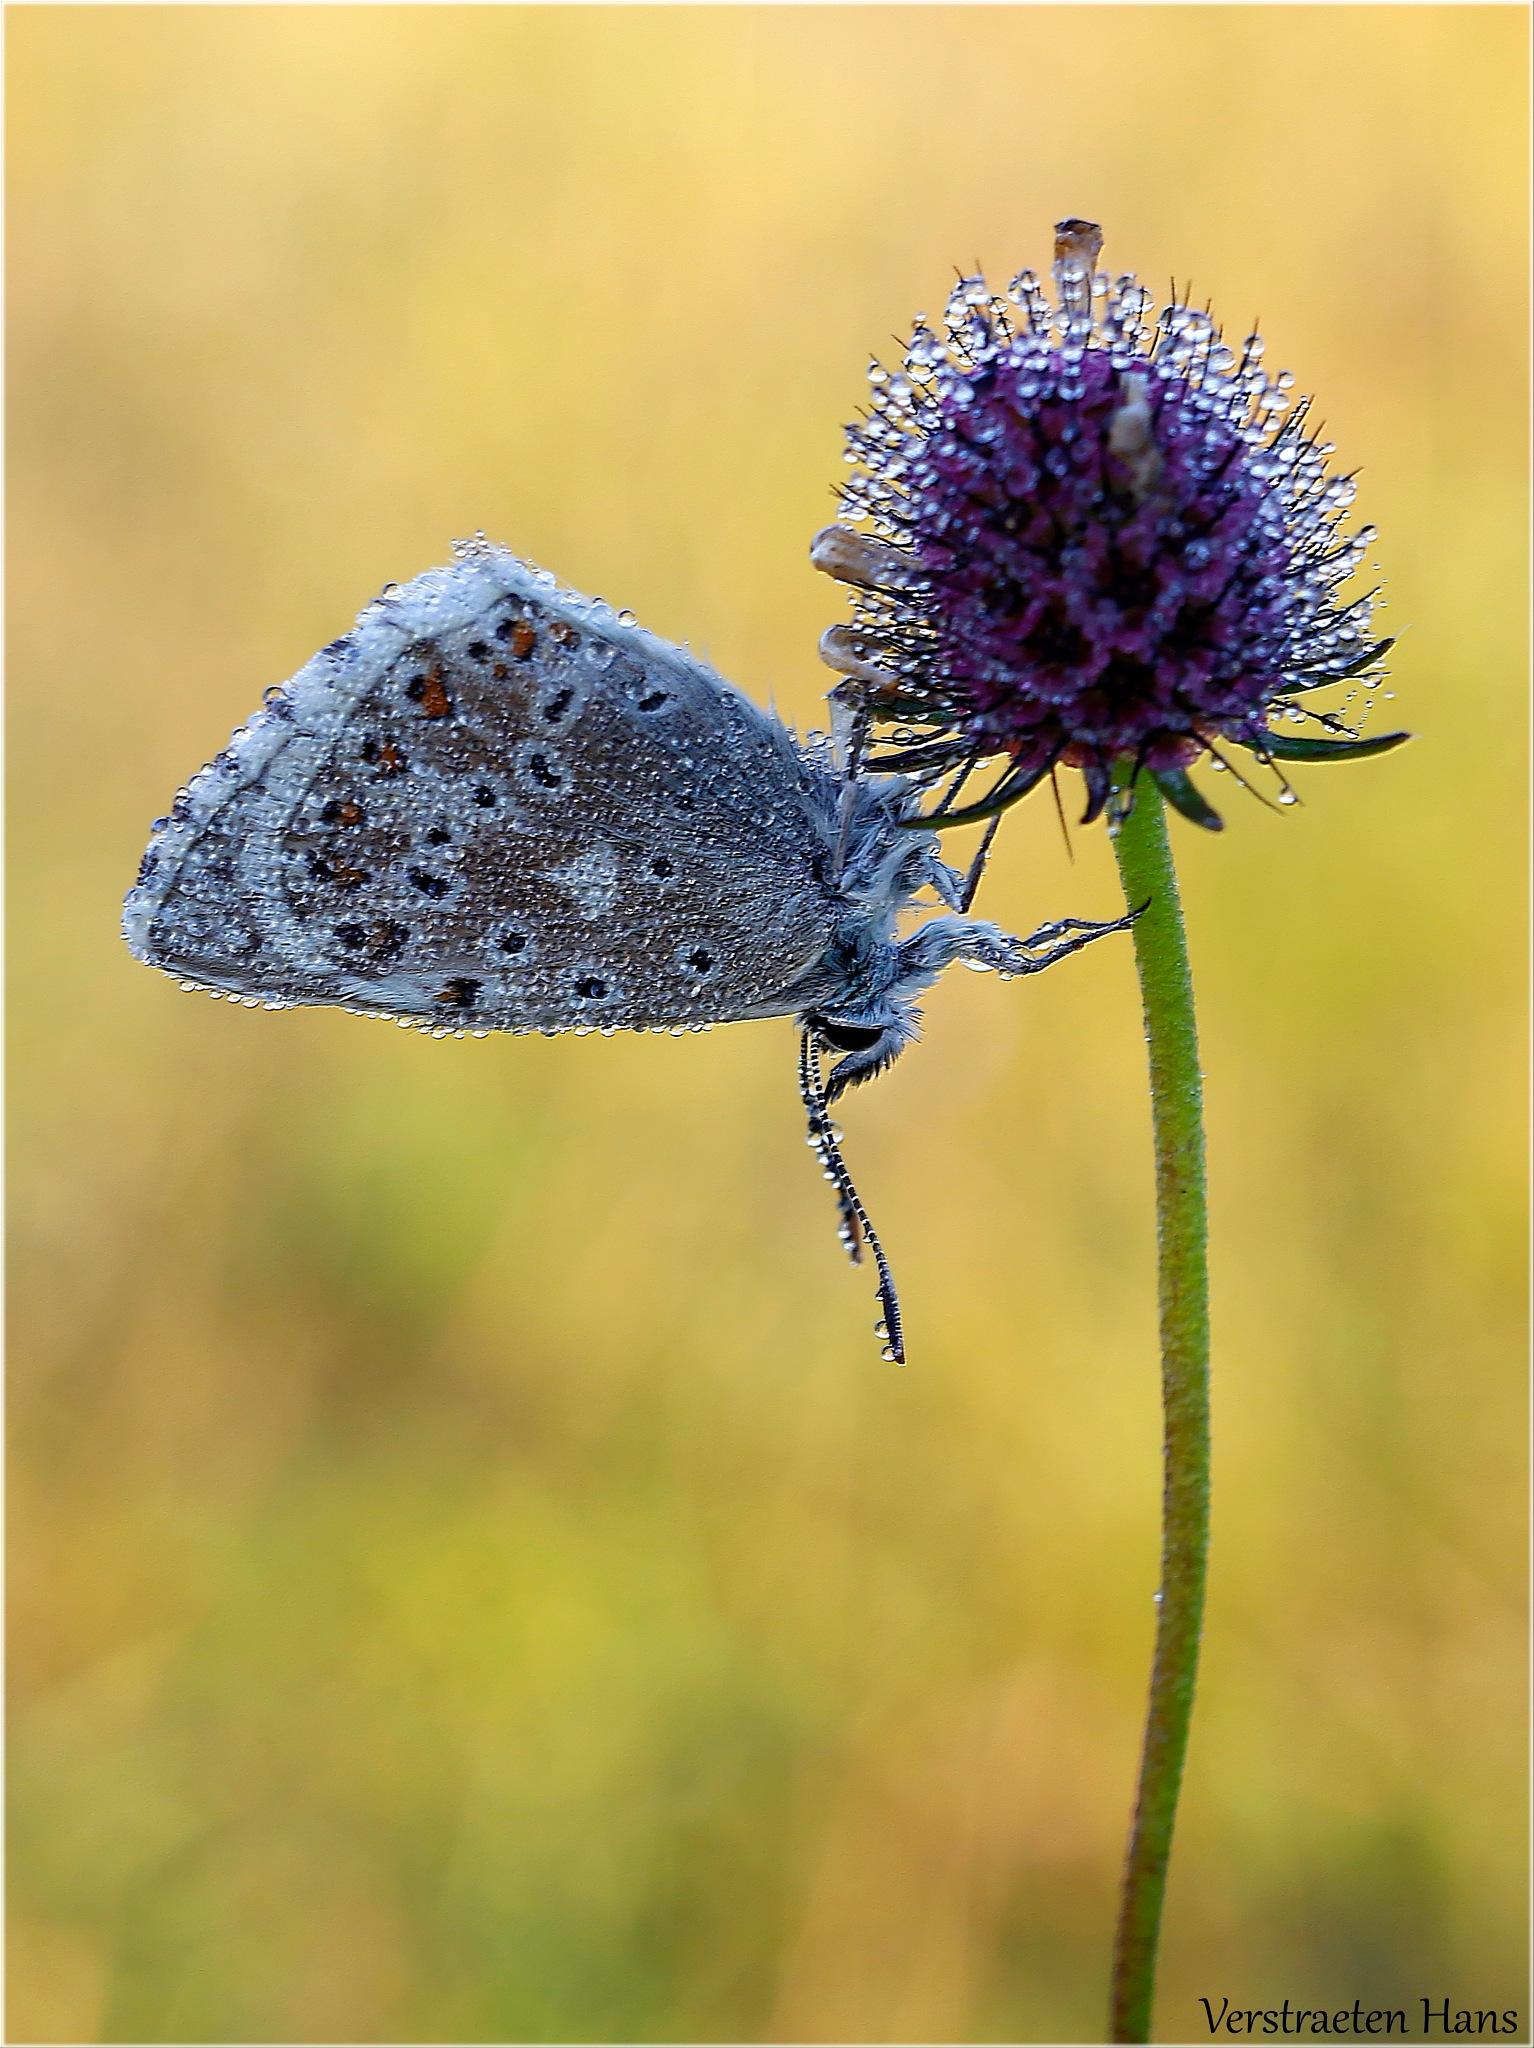 Bleek blauwtje (Polyommatus coridon) by zard319